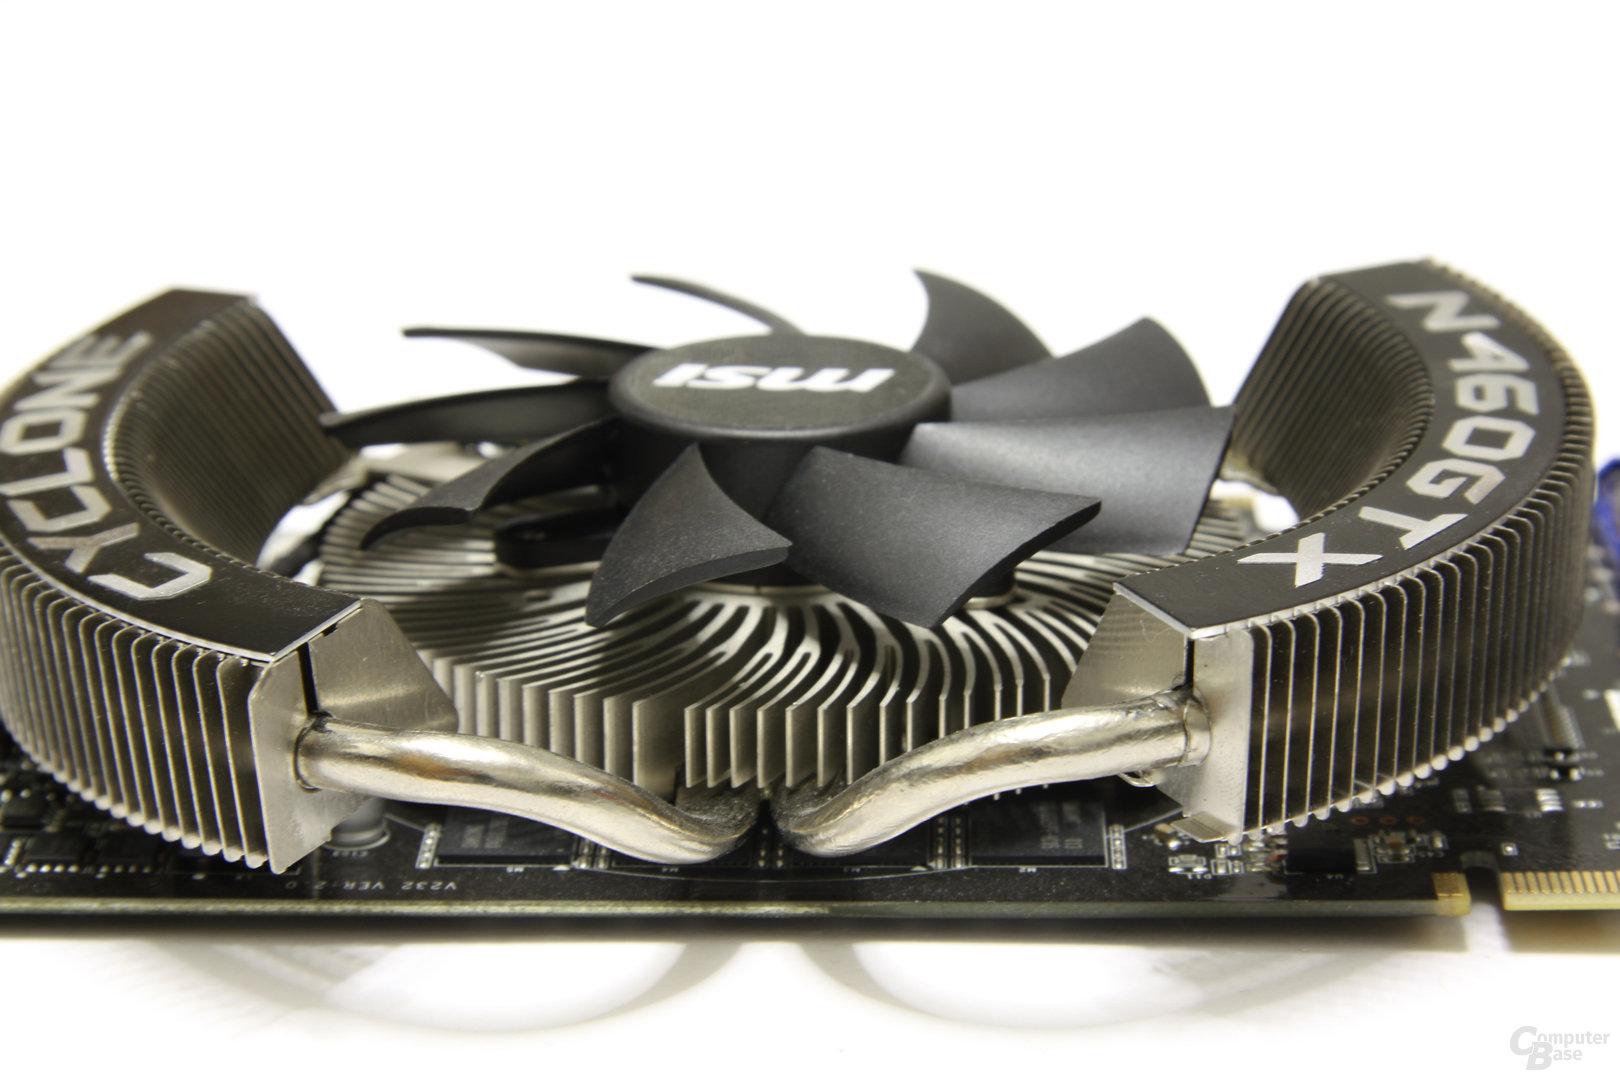 GeForce GTX 460 Cyclone OC Heatpipes